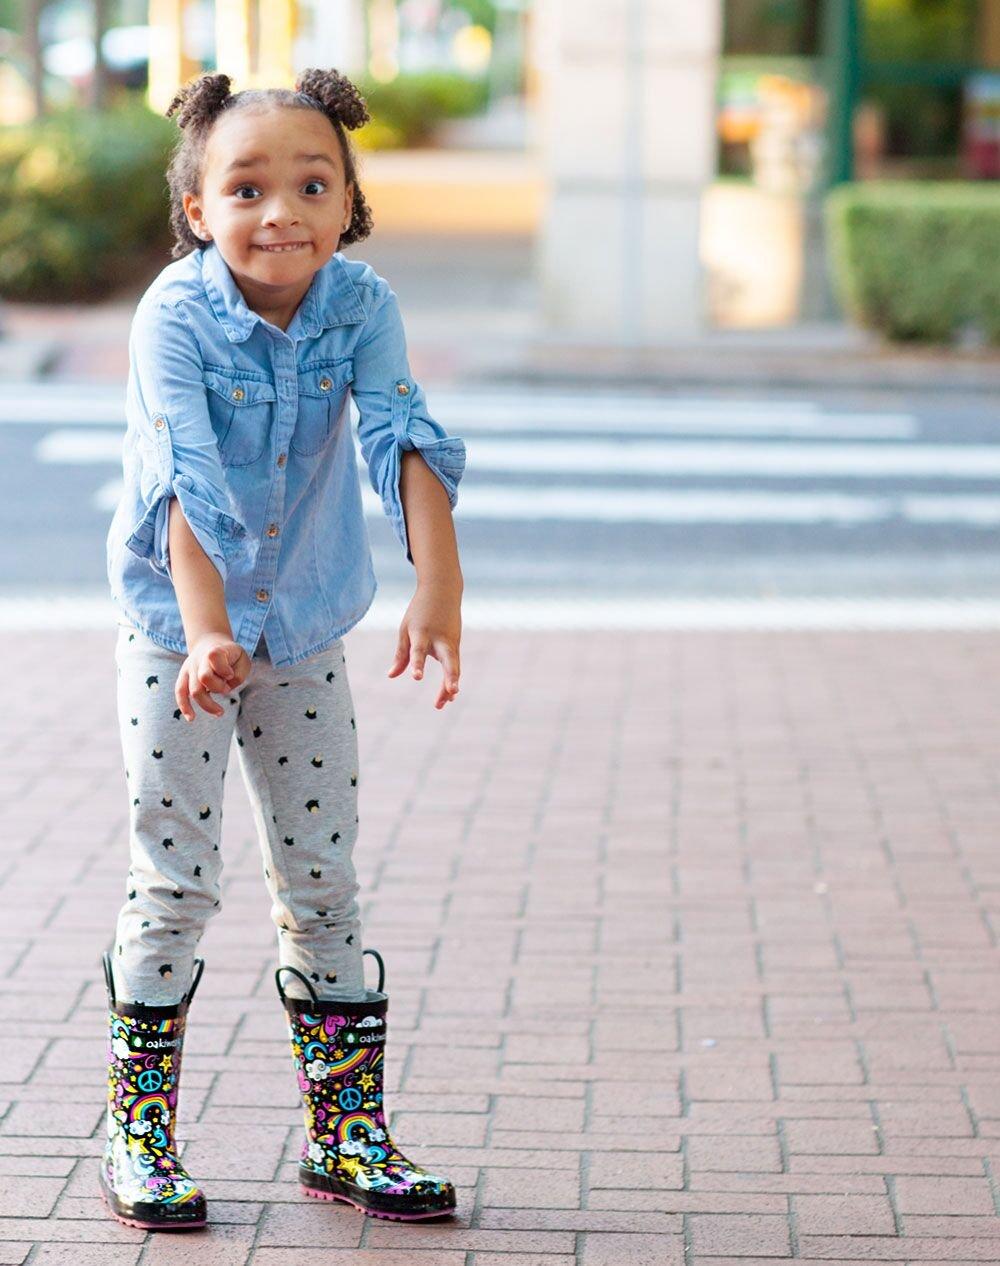 Oakiwear Kids Rubber Rain Boots with Easy-On Handles, Peace, Love & Rainbows, 11T US Toddler, Peace by Oakiwear (Image #7)